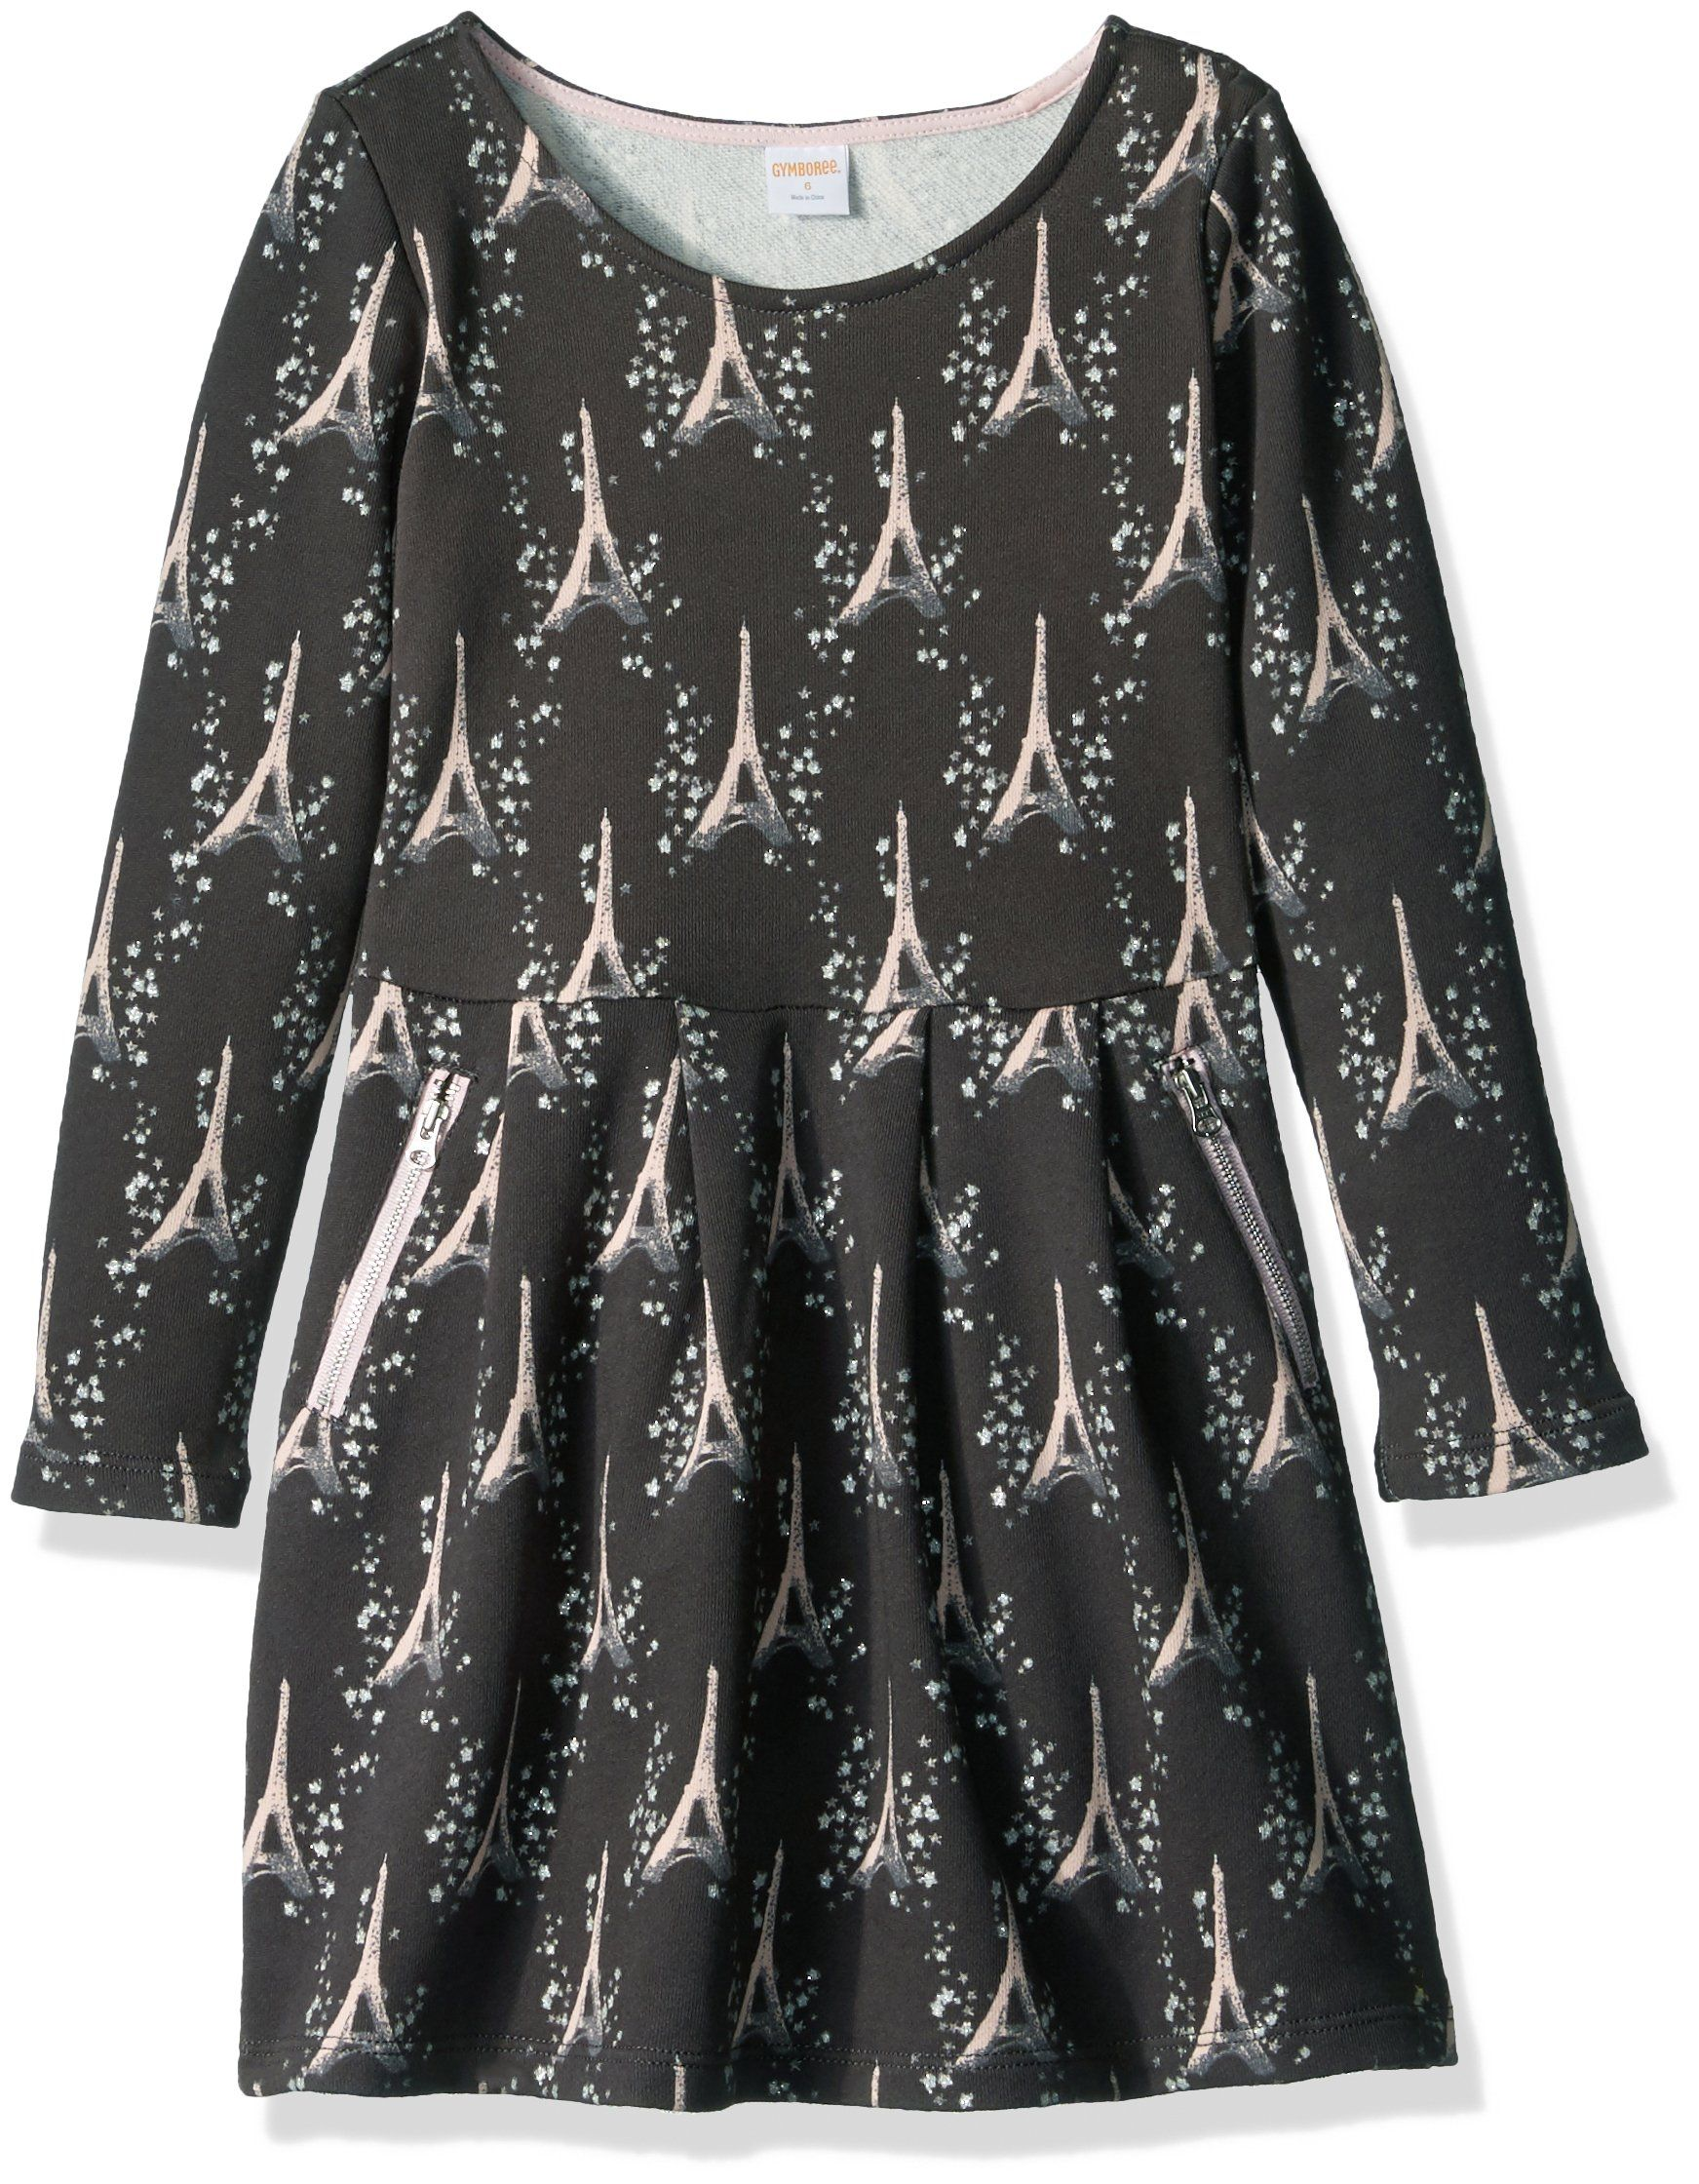 Gymboree big girlsu star print dress multi easy pullover style